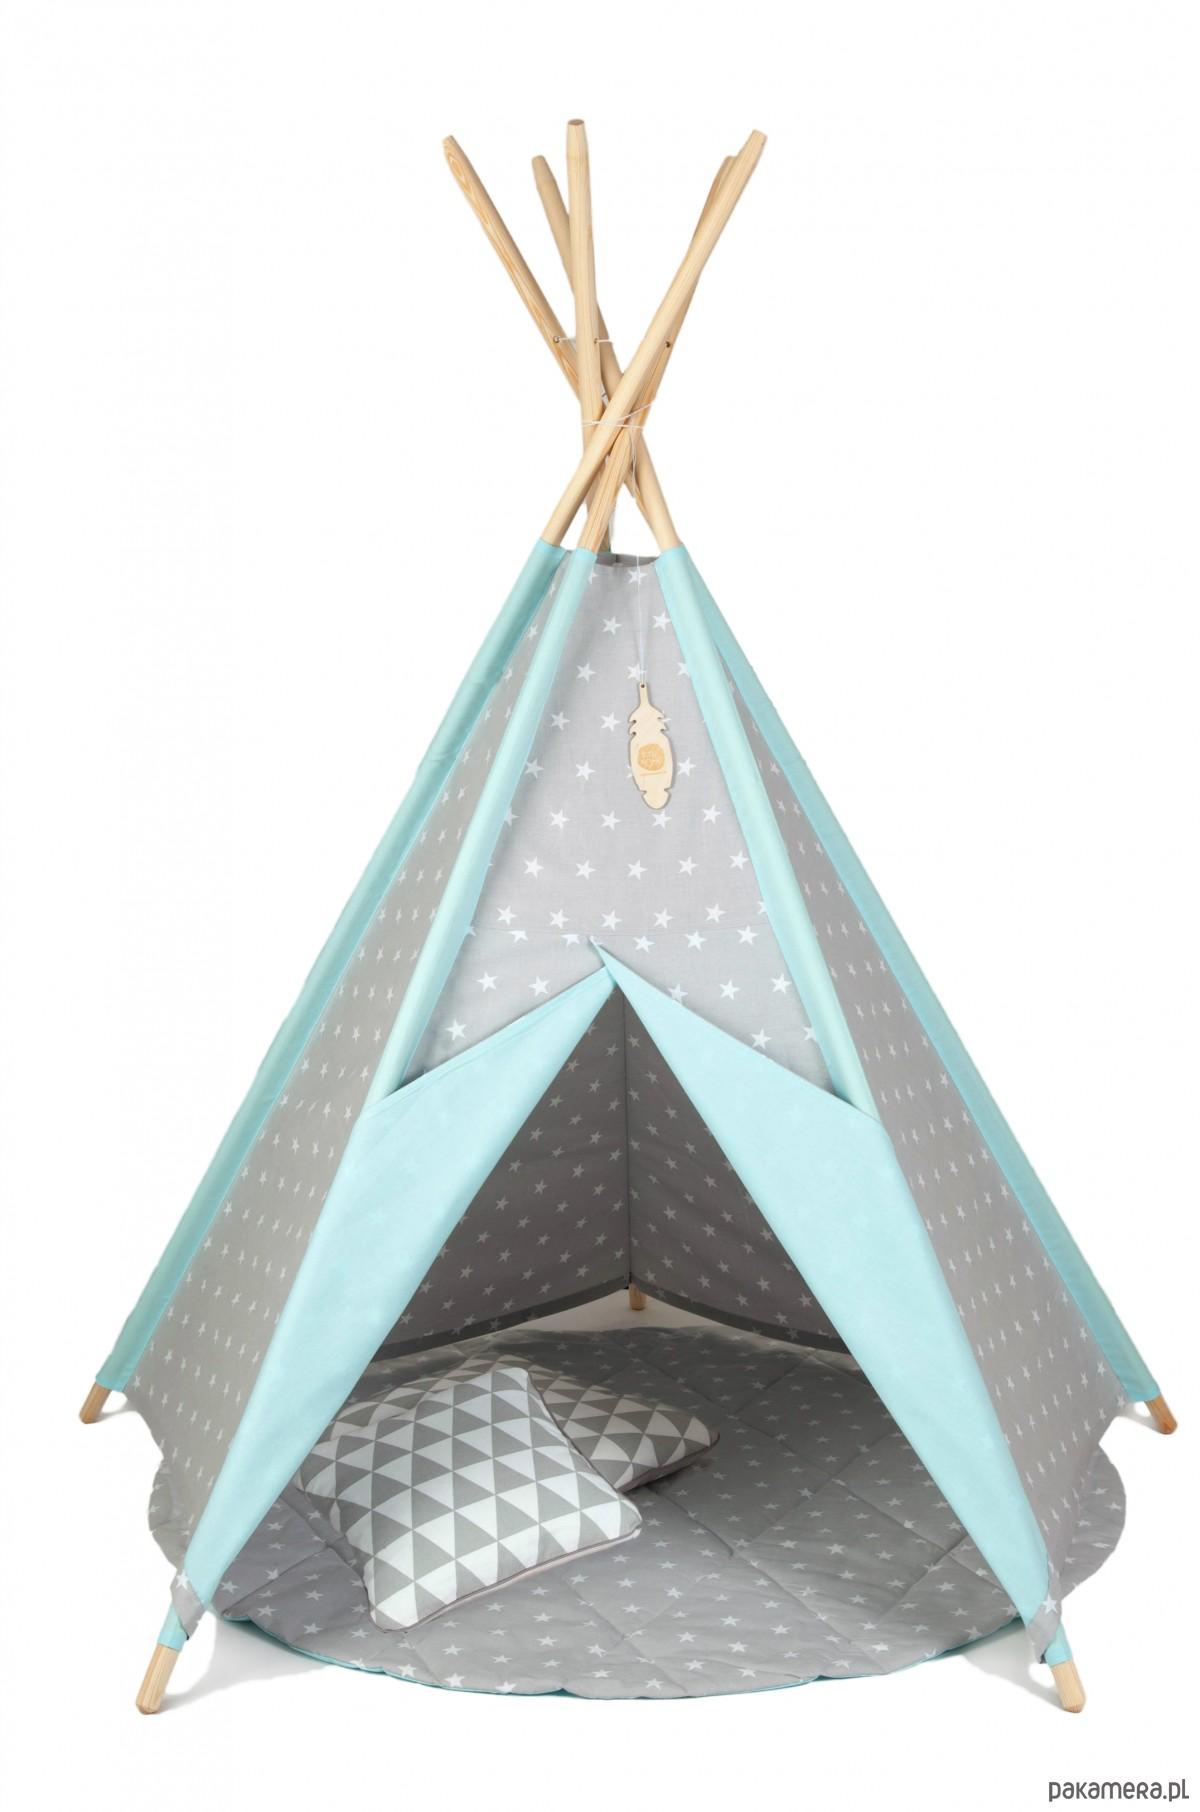 tipi littlenomad namiot wigwam pok j dziecka